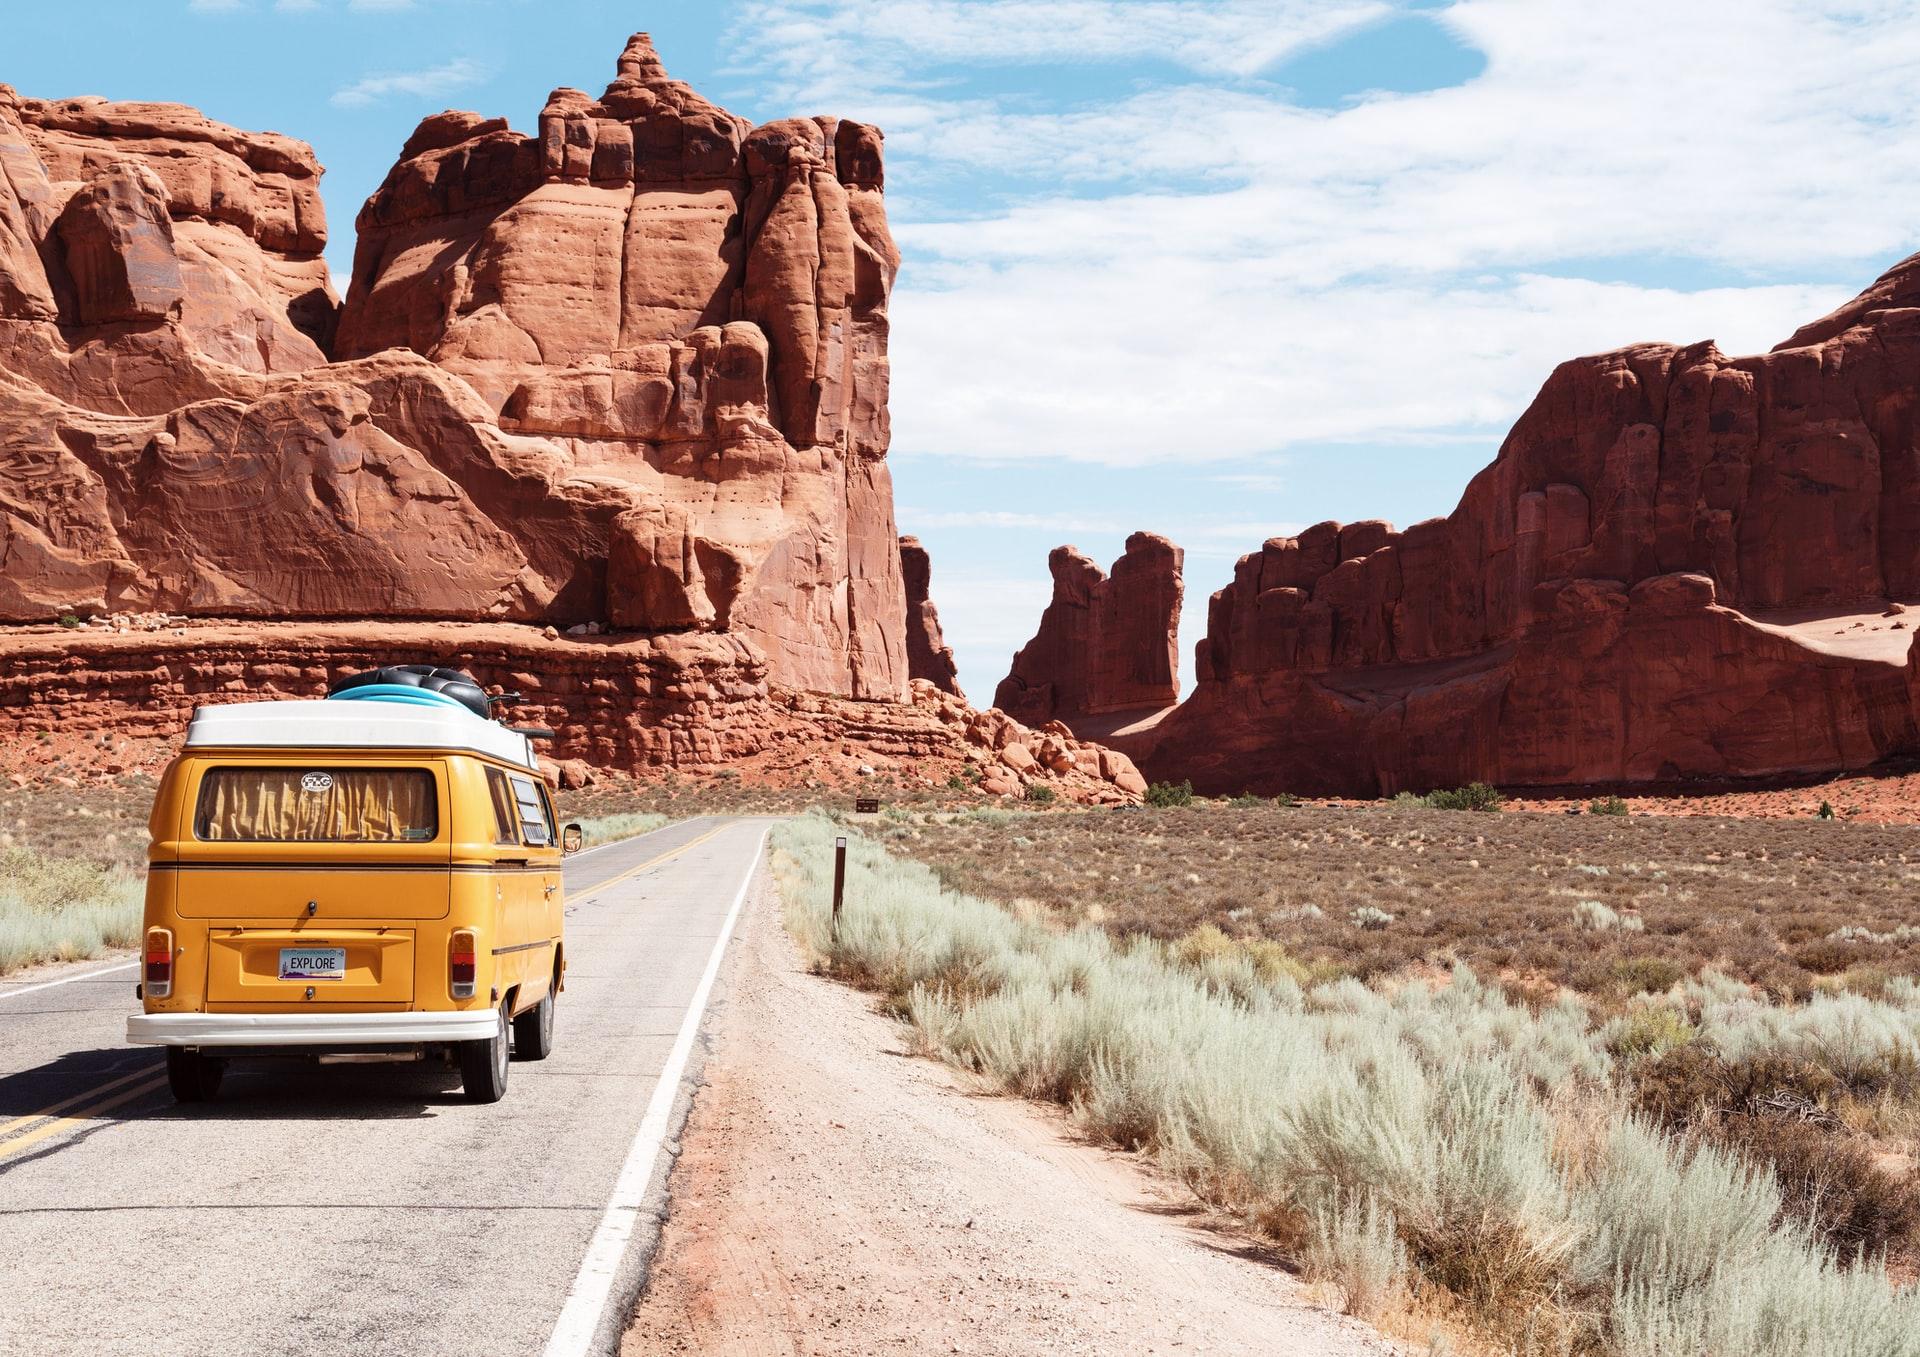 Arches national park entrance station, moab, united states